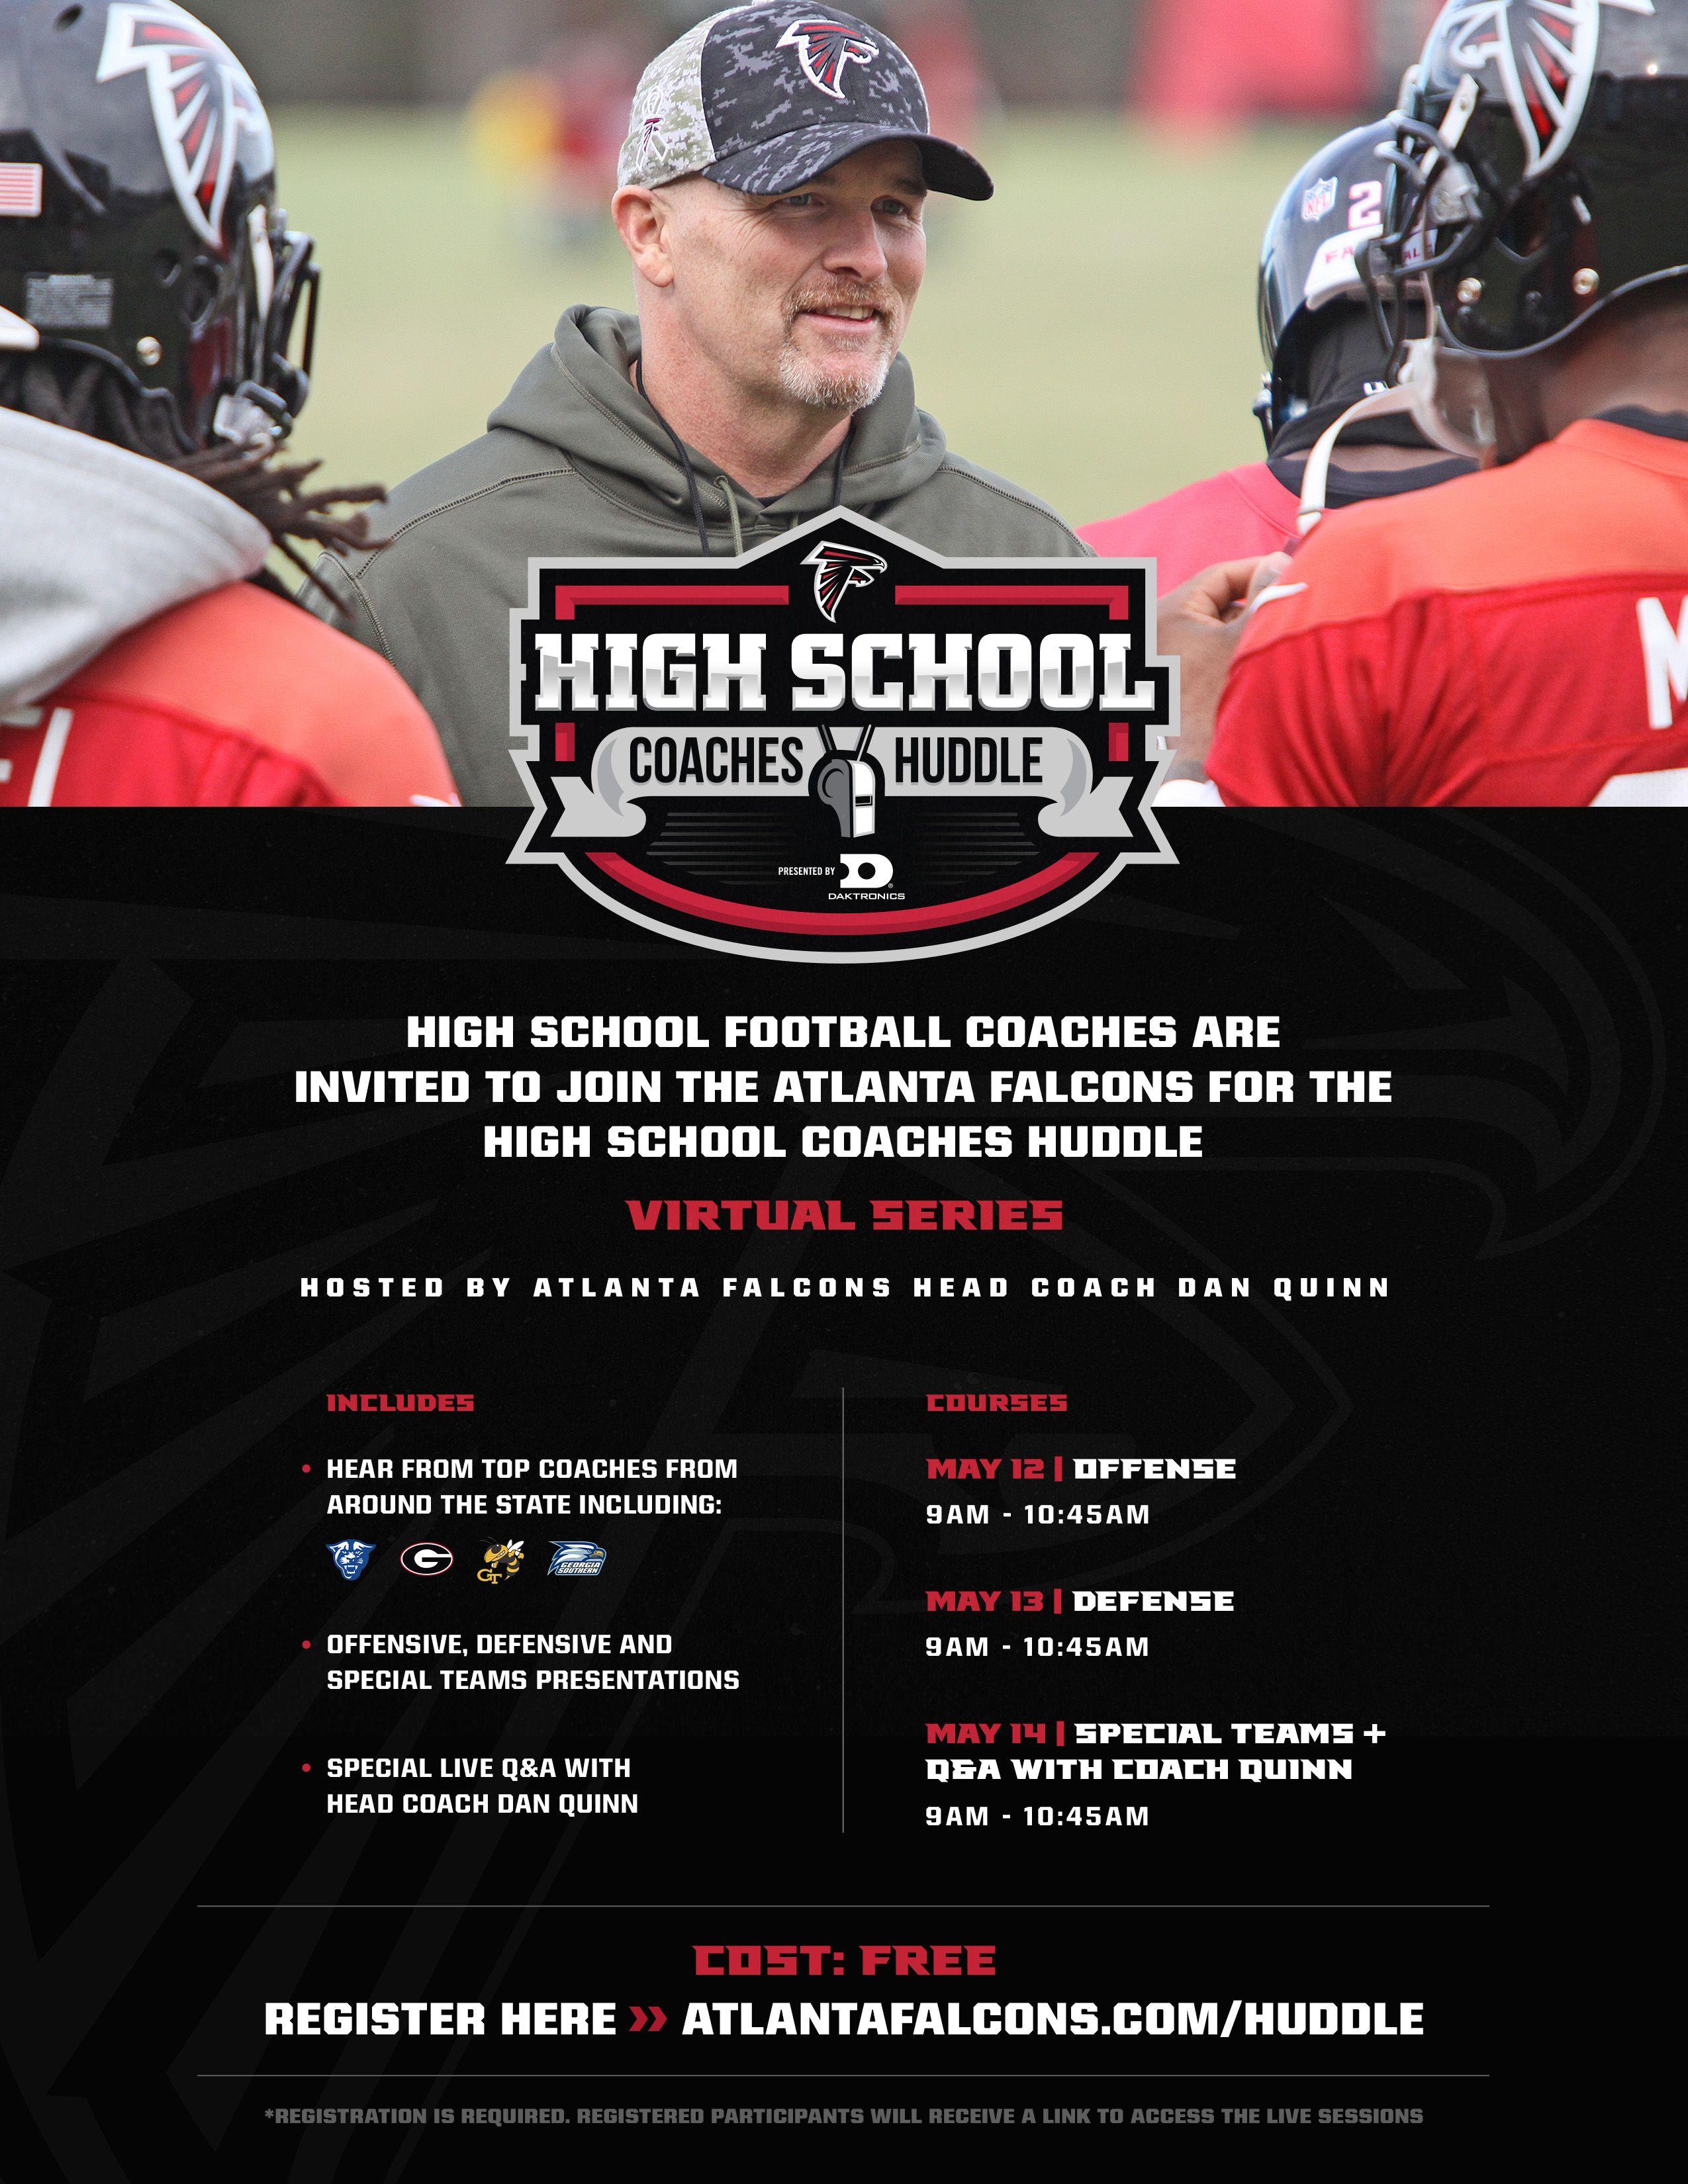 High School Coaches Huddle presented by Daktronics